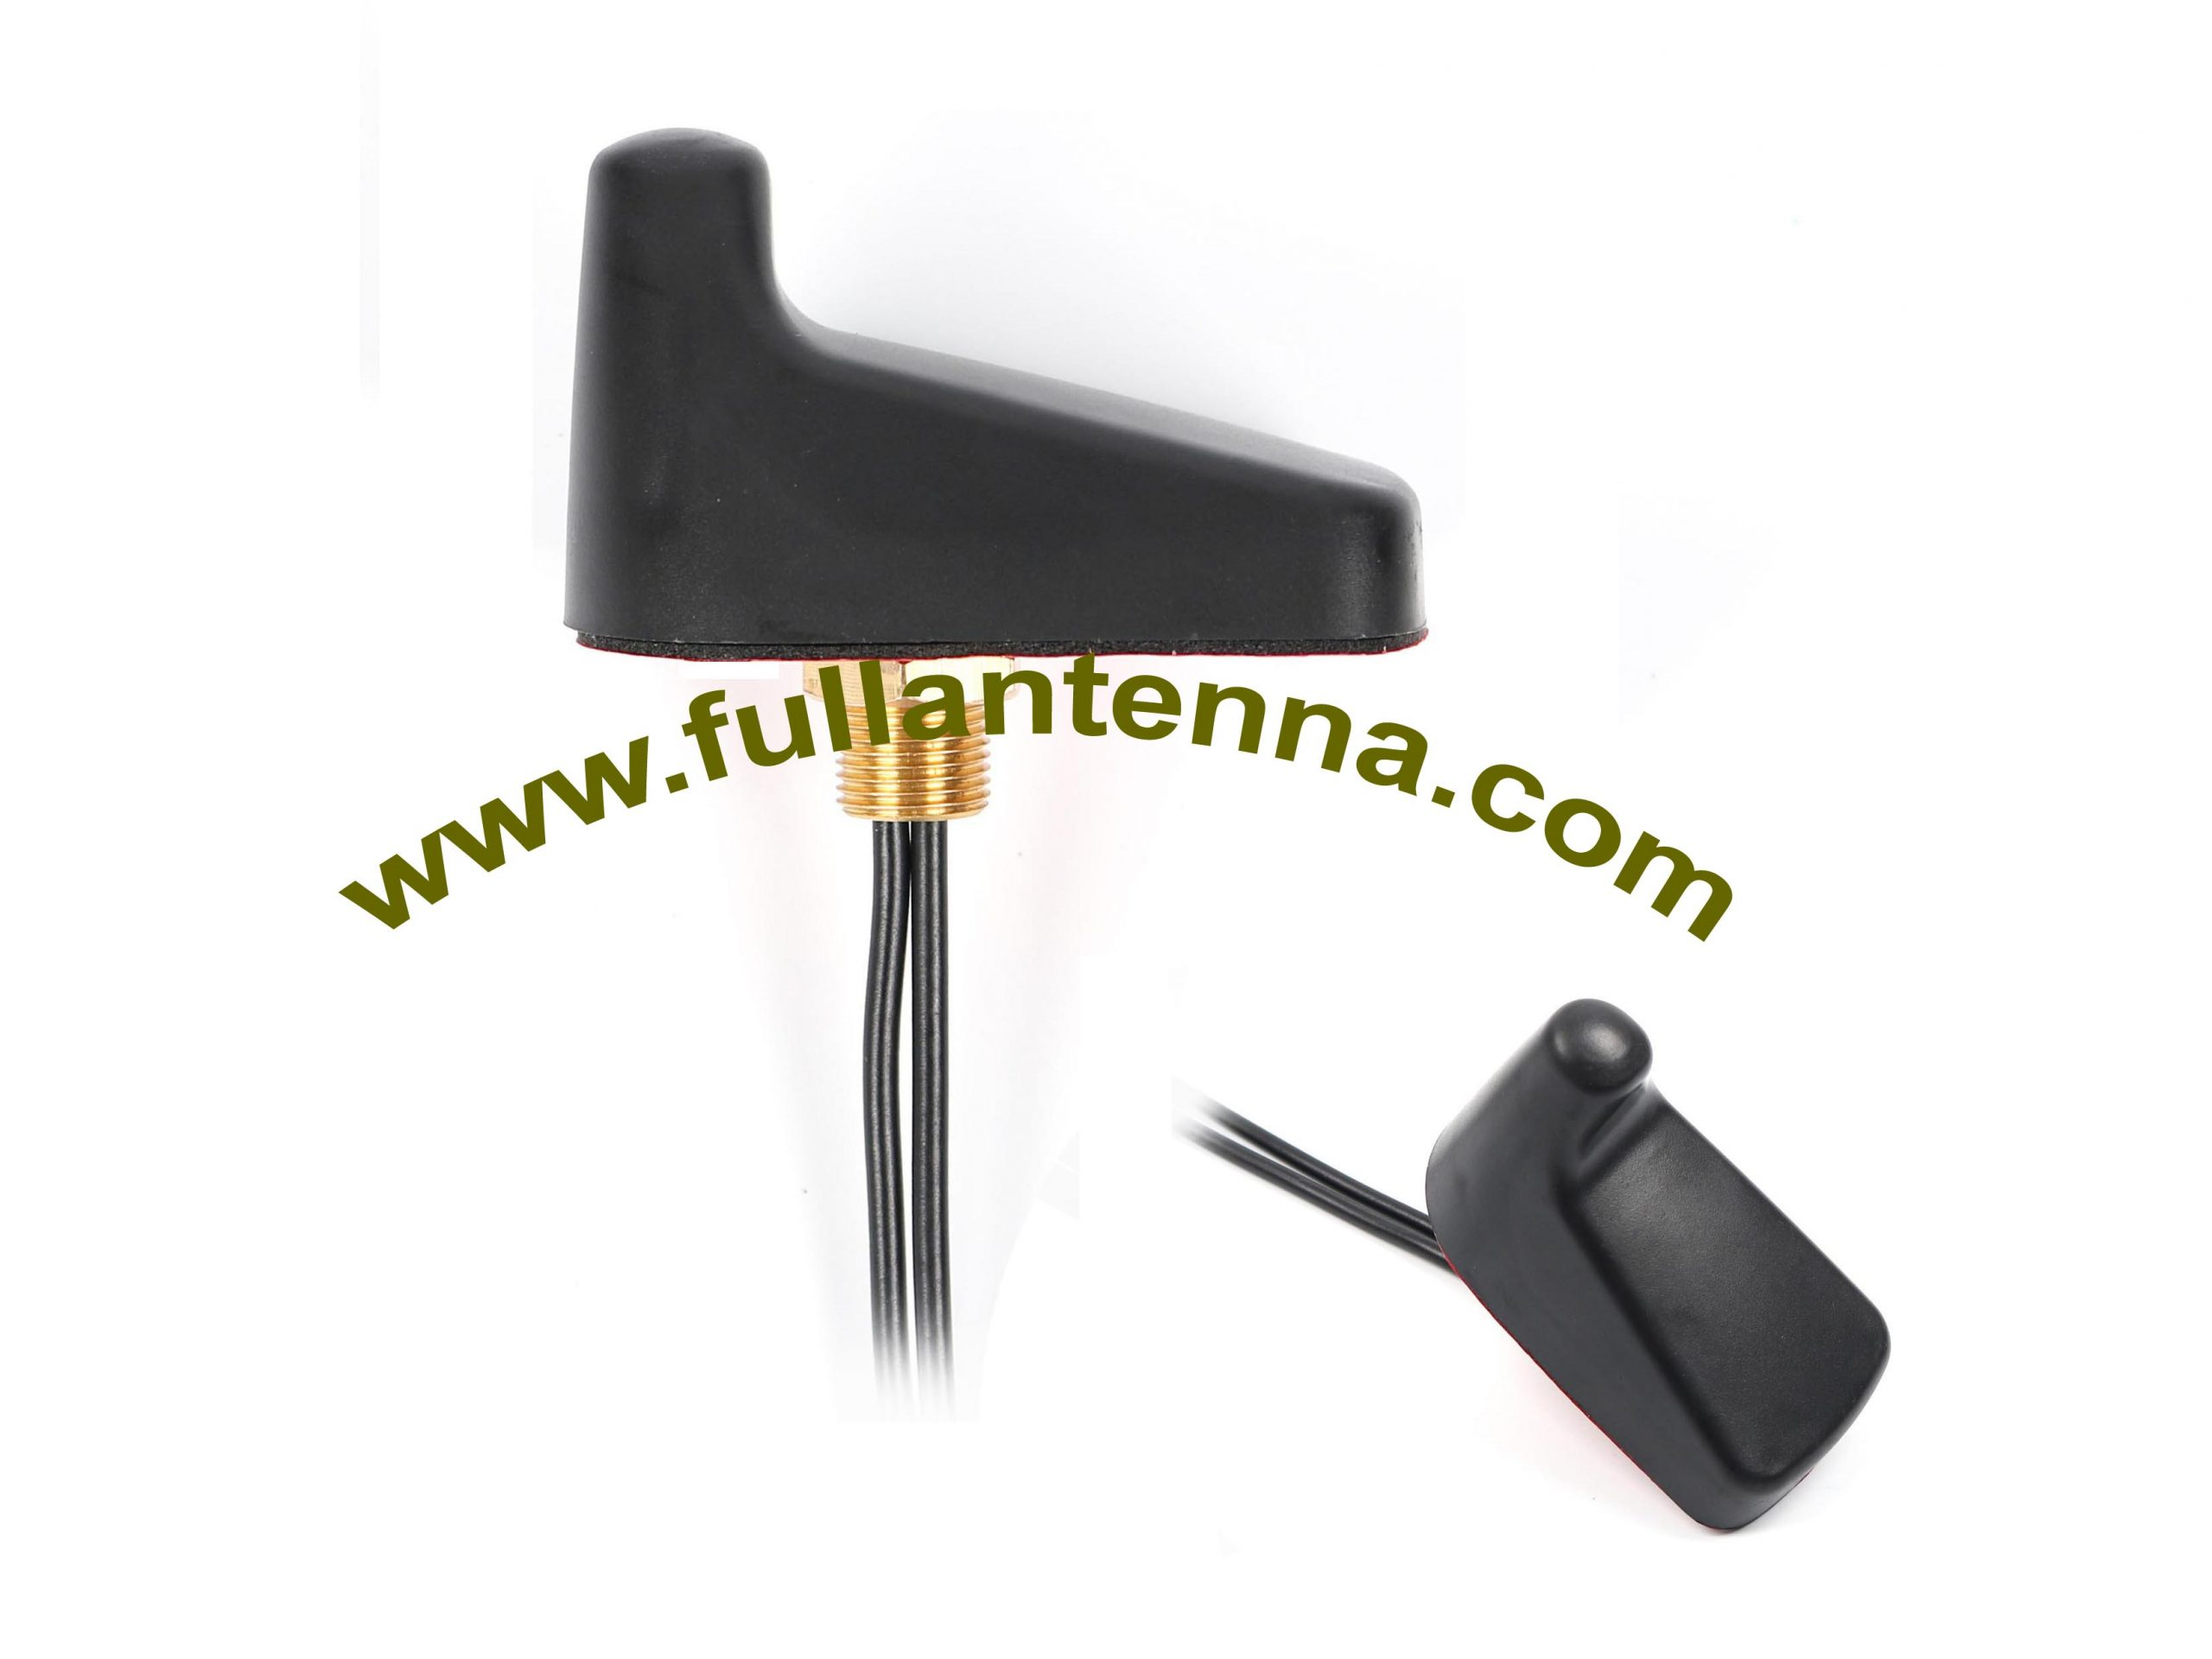 P/N:FAGPSGSM.03,2 In 1 Combined Antenna,GPS GSM external antenna screw mount